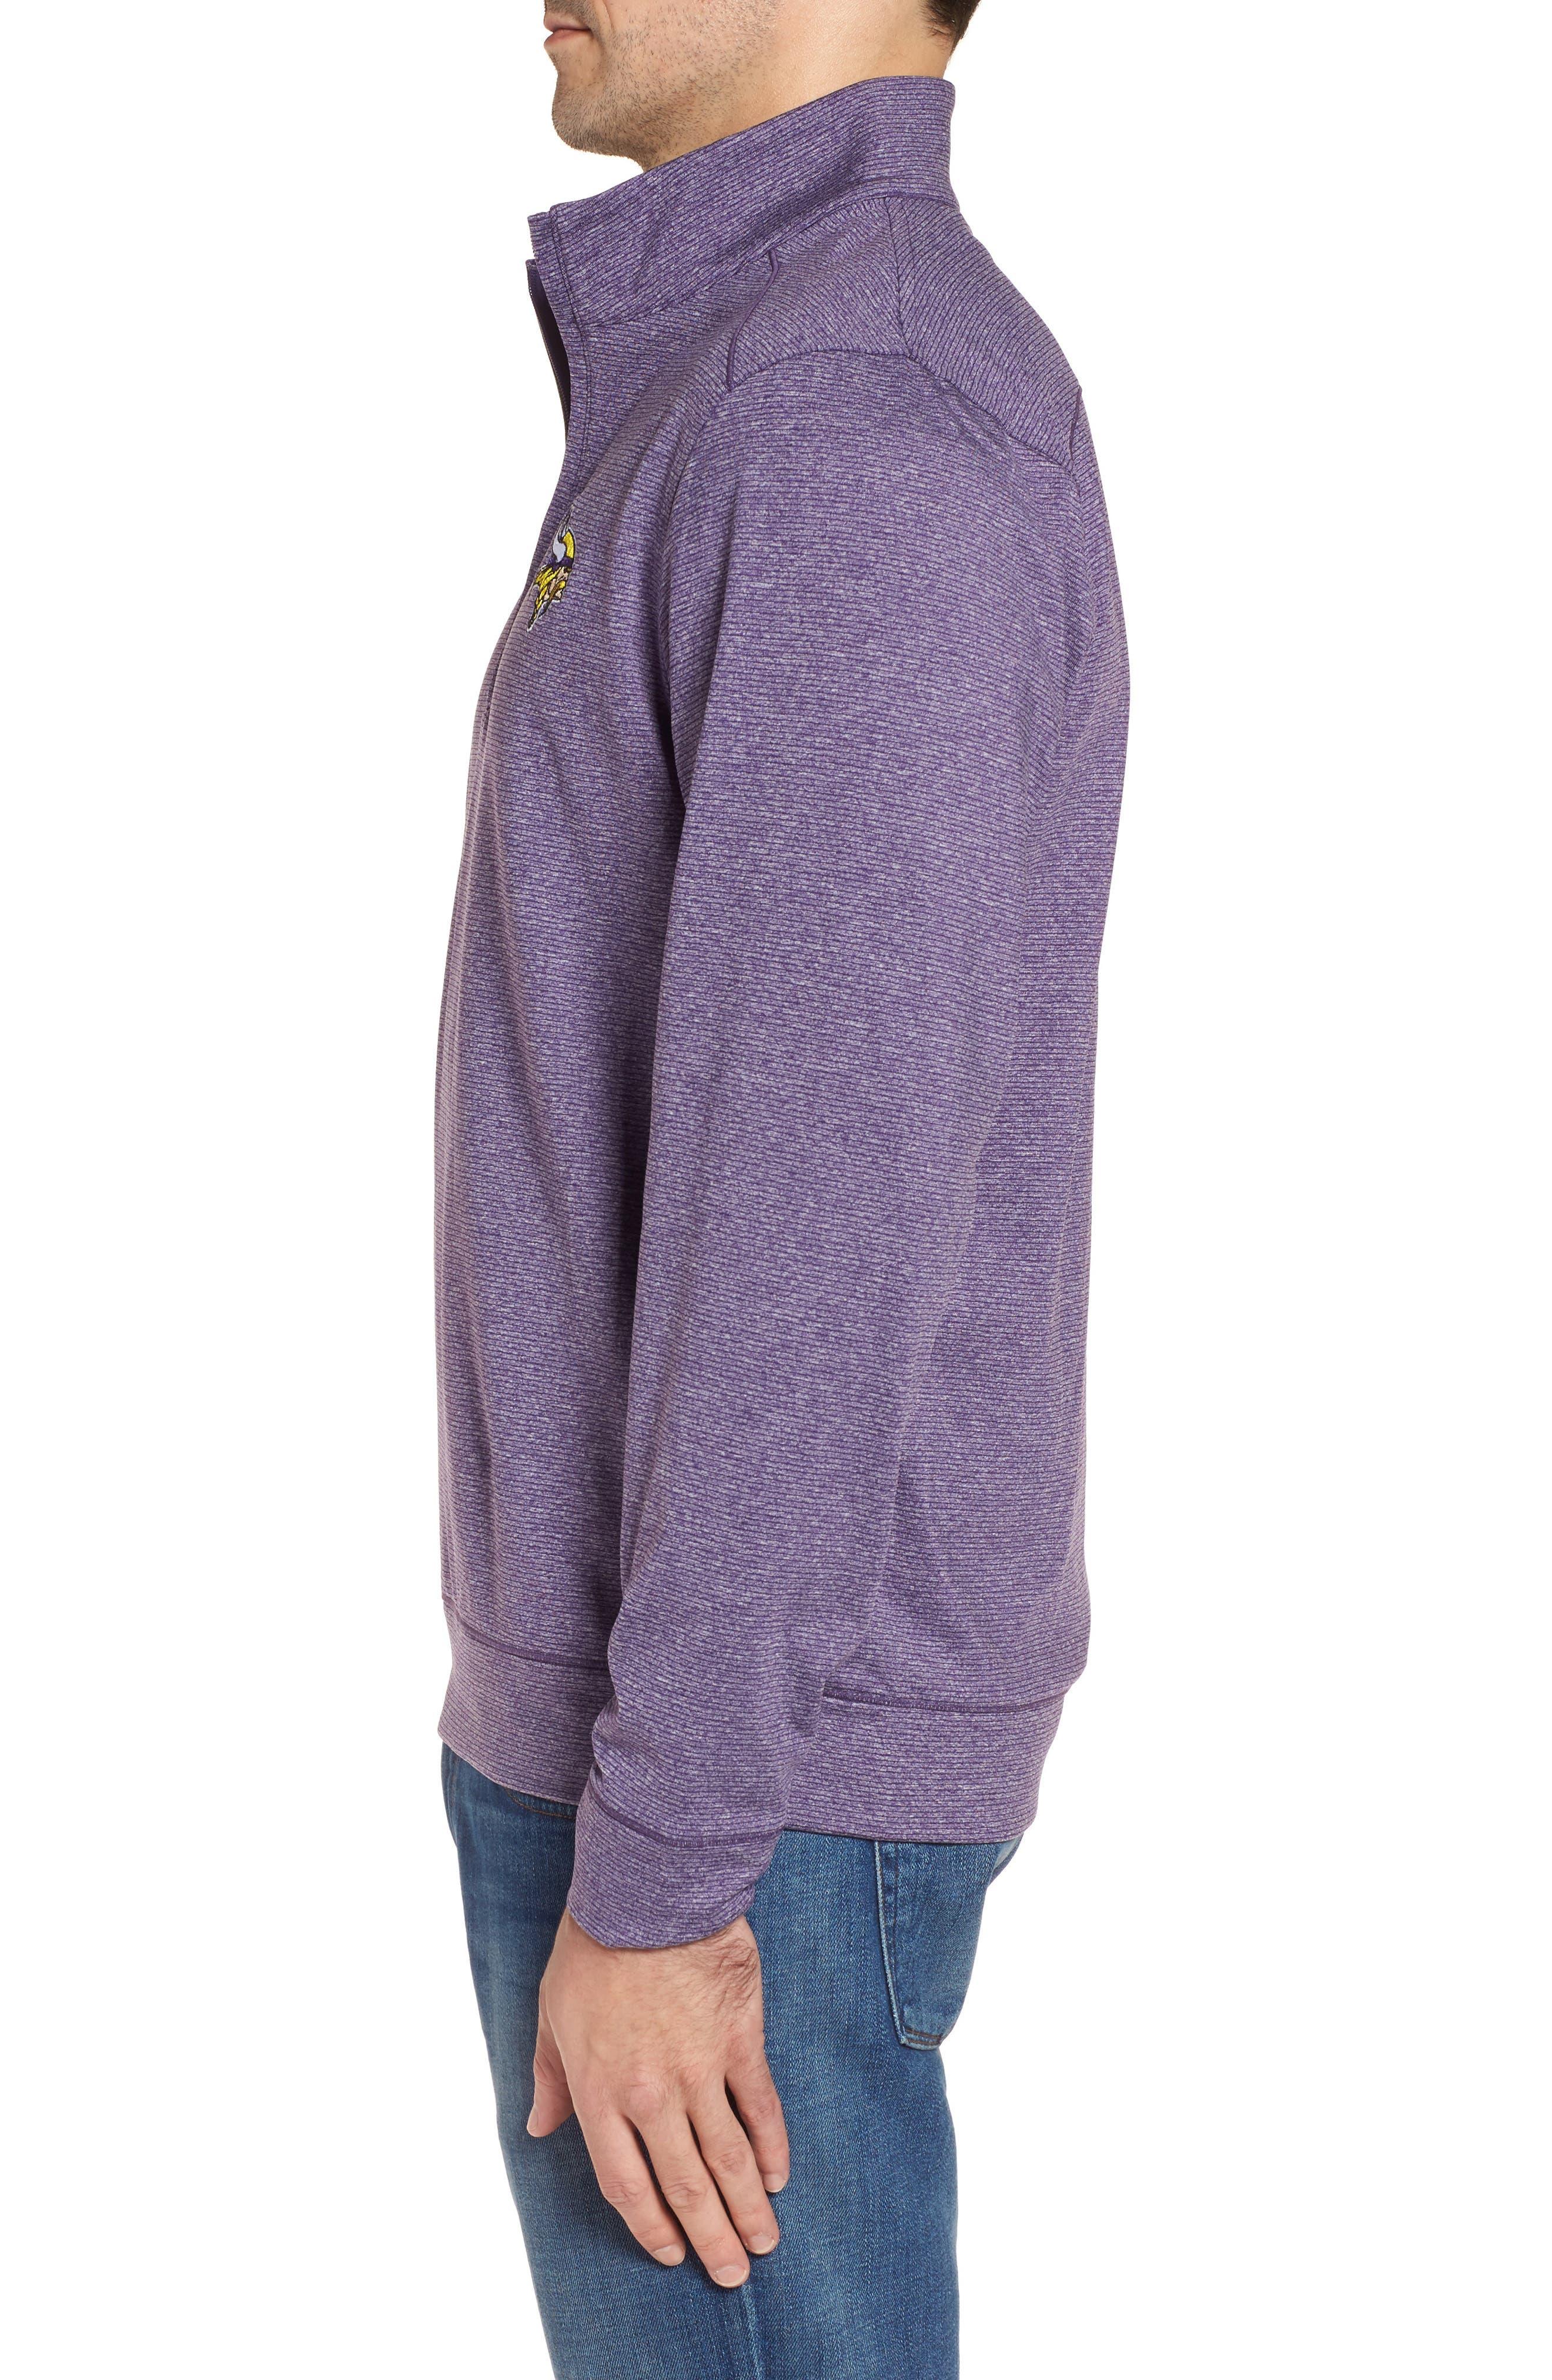 Shoreline - Minnesota Vikings Half Zip Pullover,                             Alternate thumbnail 3, color,                             College Purple Heather